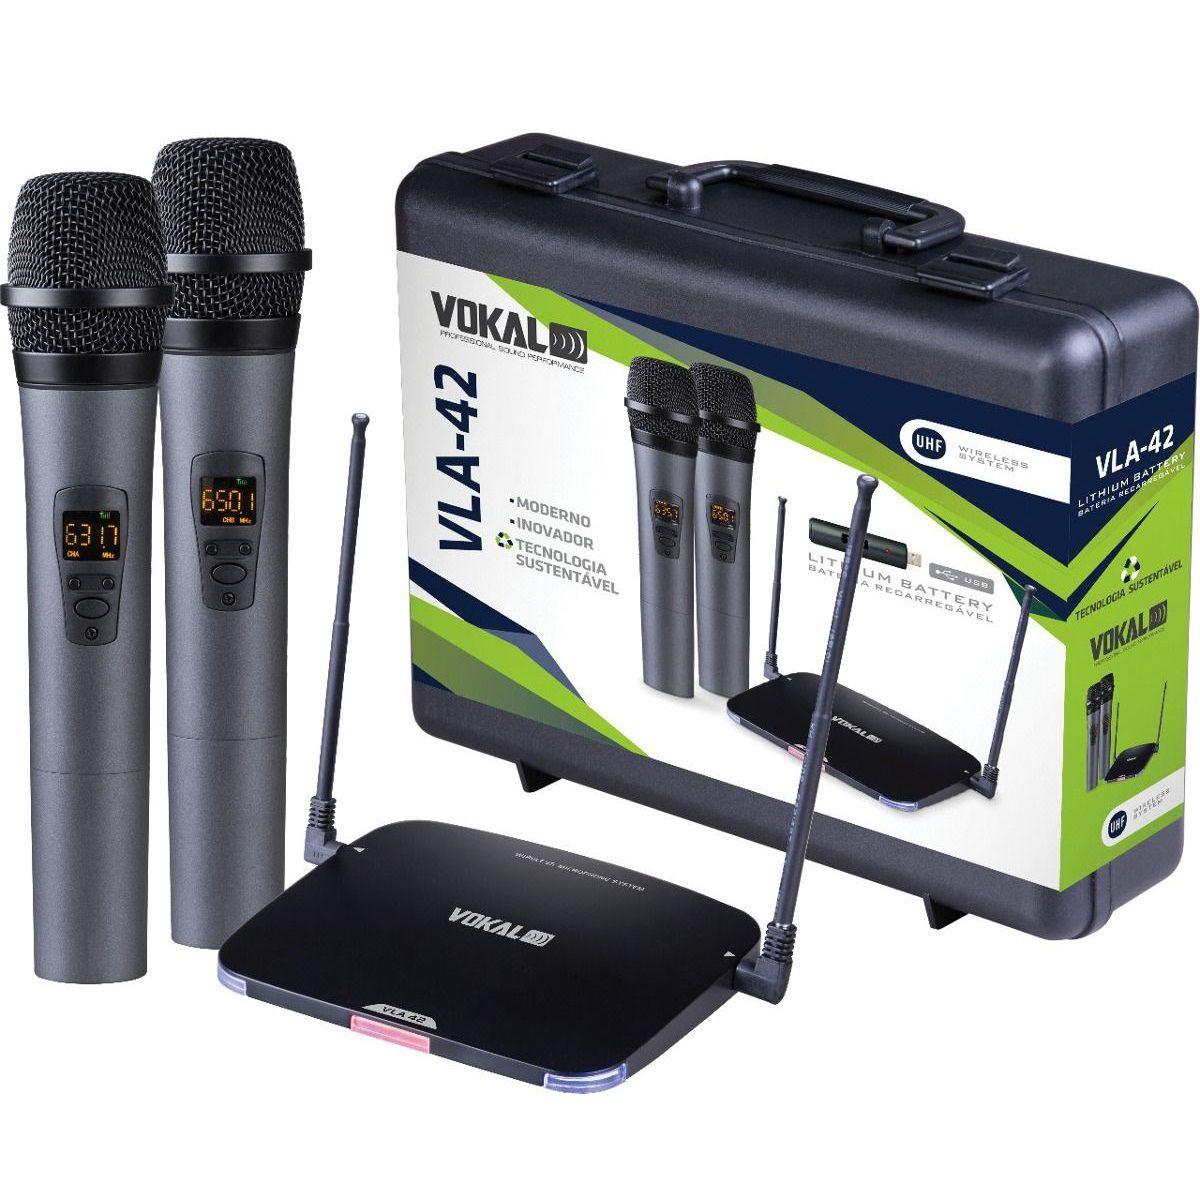 Kit Caixa De Som Ativa Passiva Wls S12 Bluetooth 430w Rms + Microfone Vokal Vla42